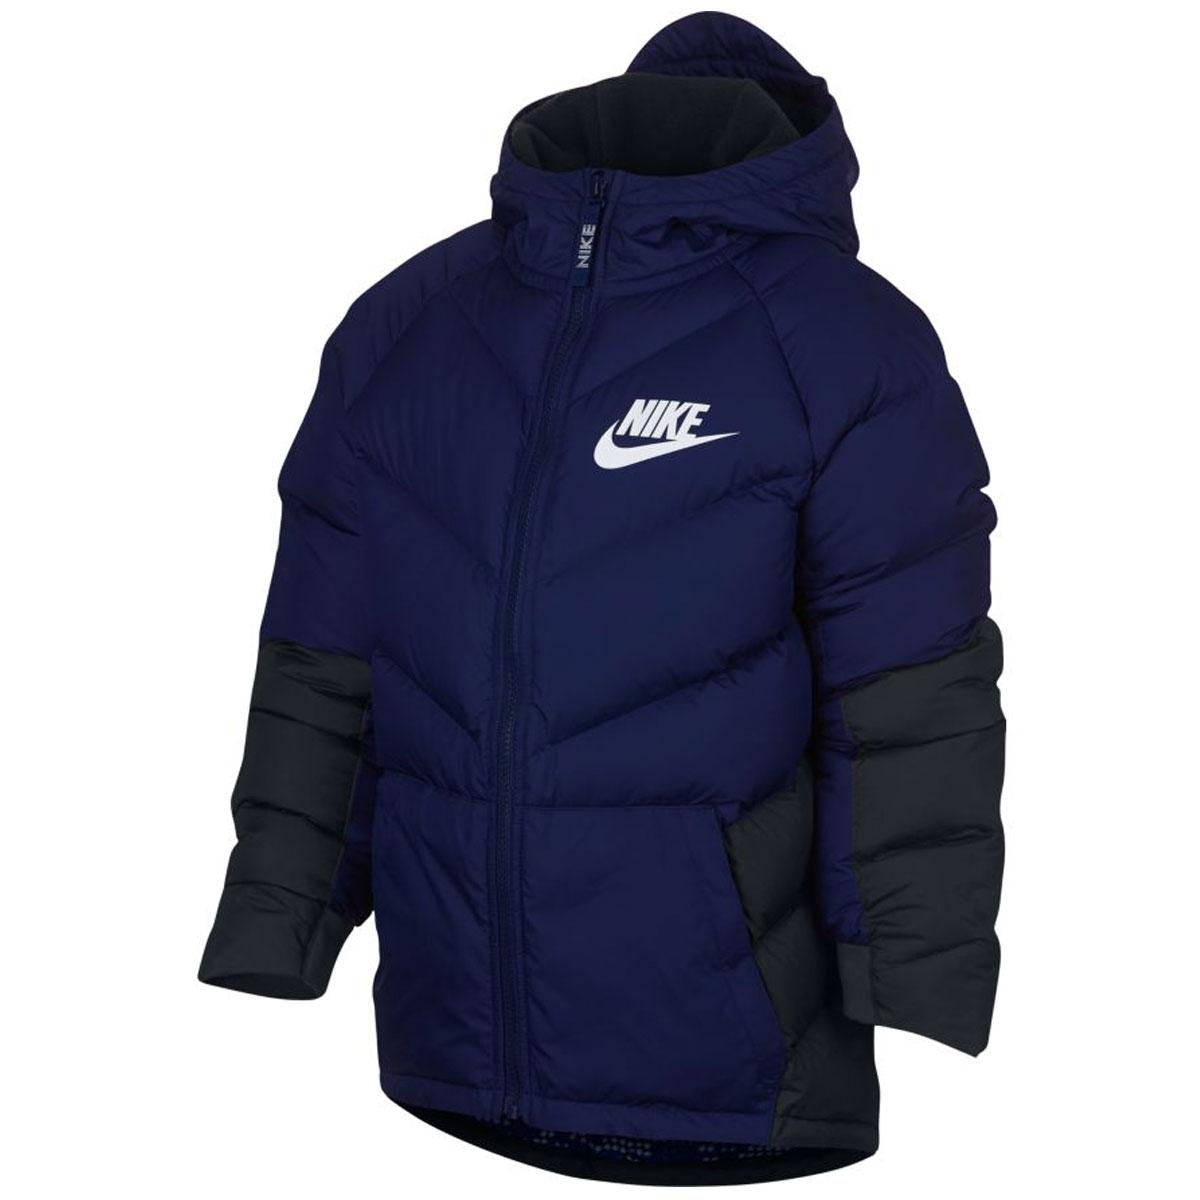 95c875cc Nike Down Filled Parka Winterjas Junior van winterjassen